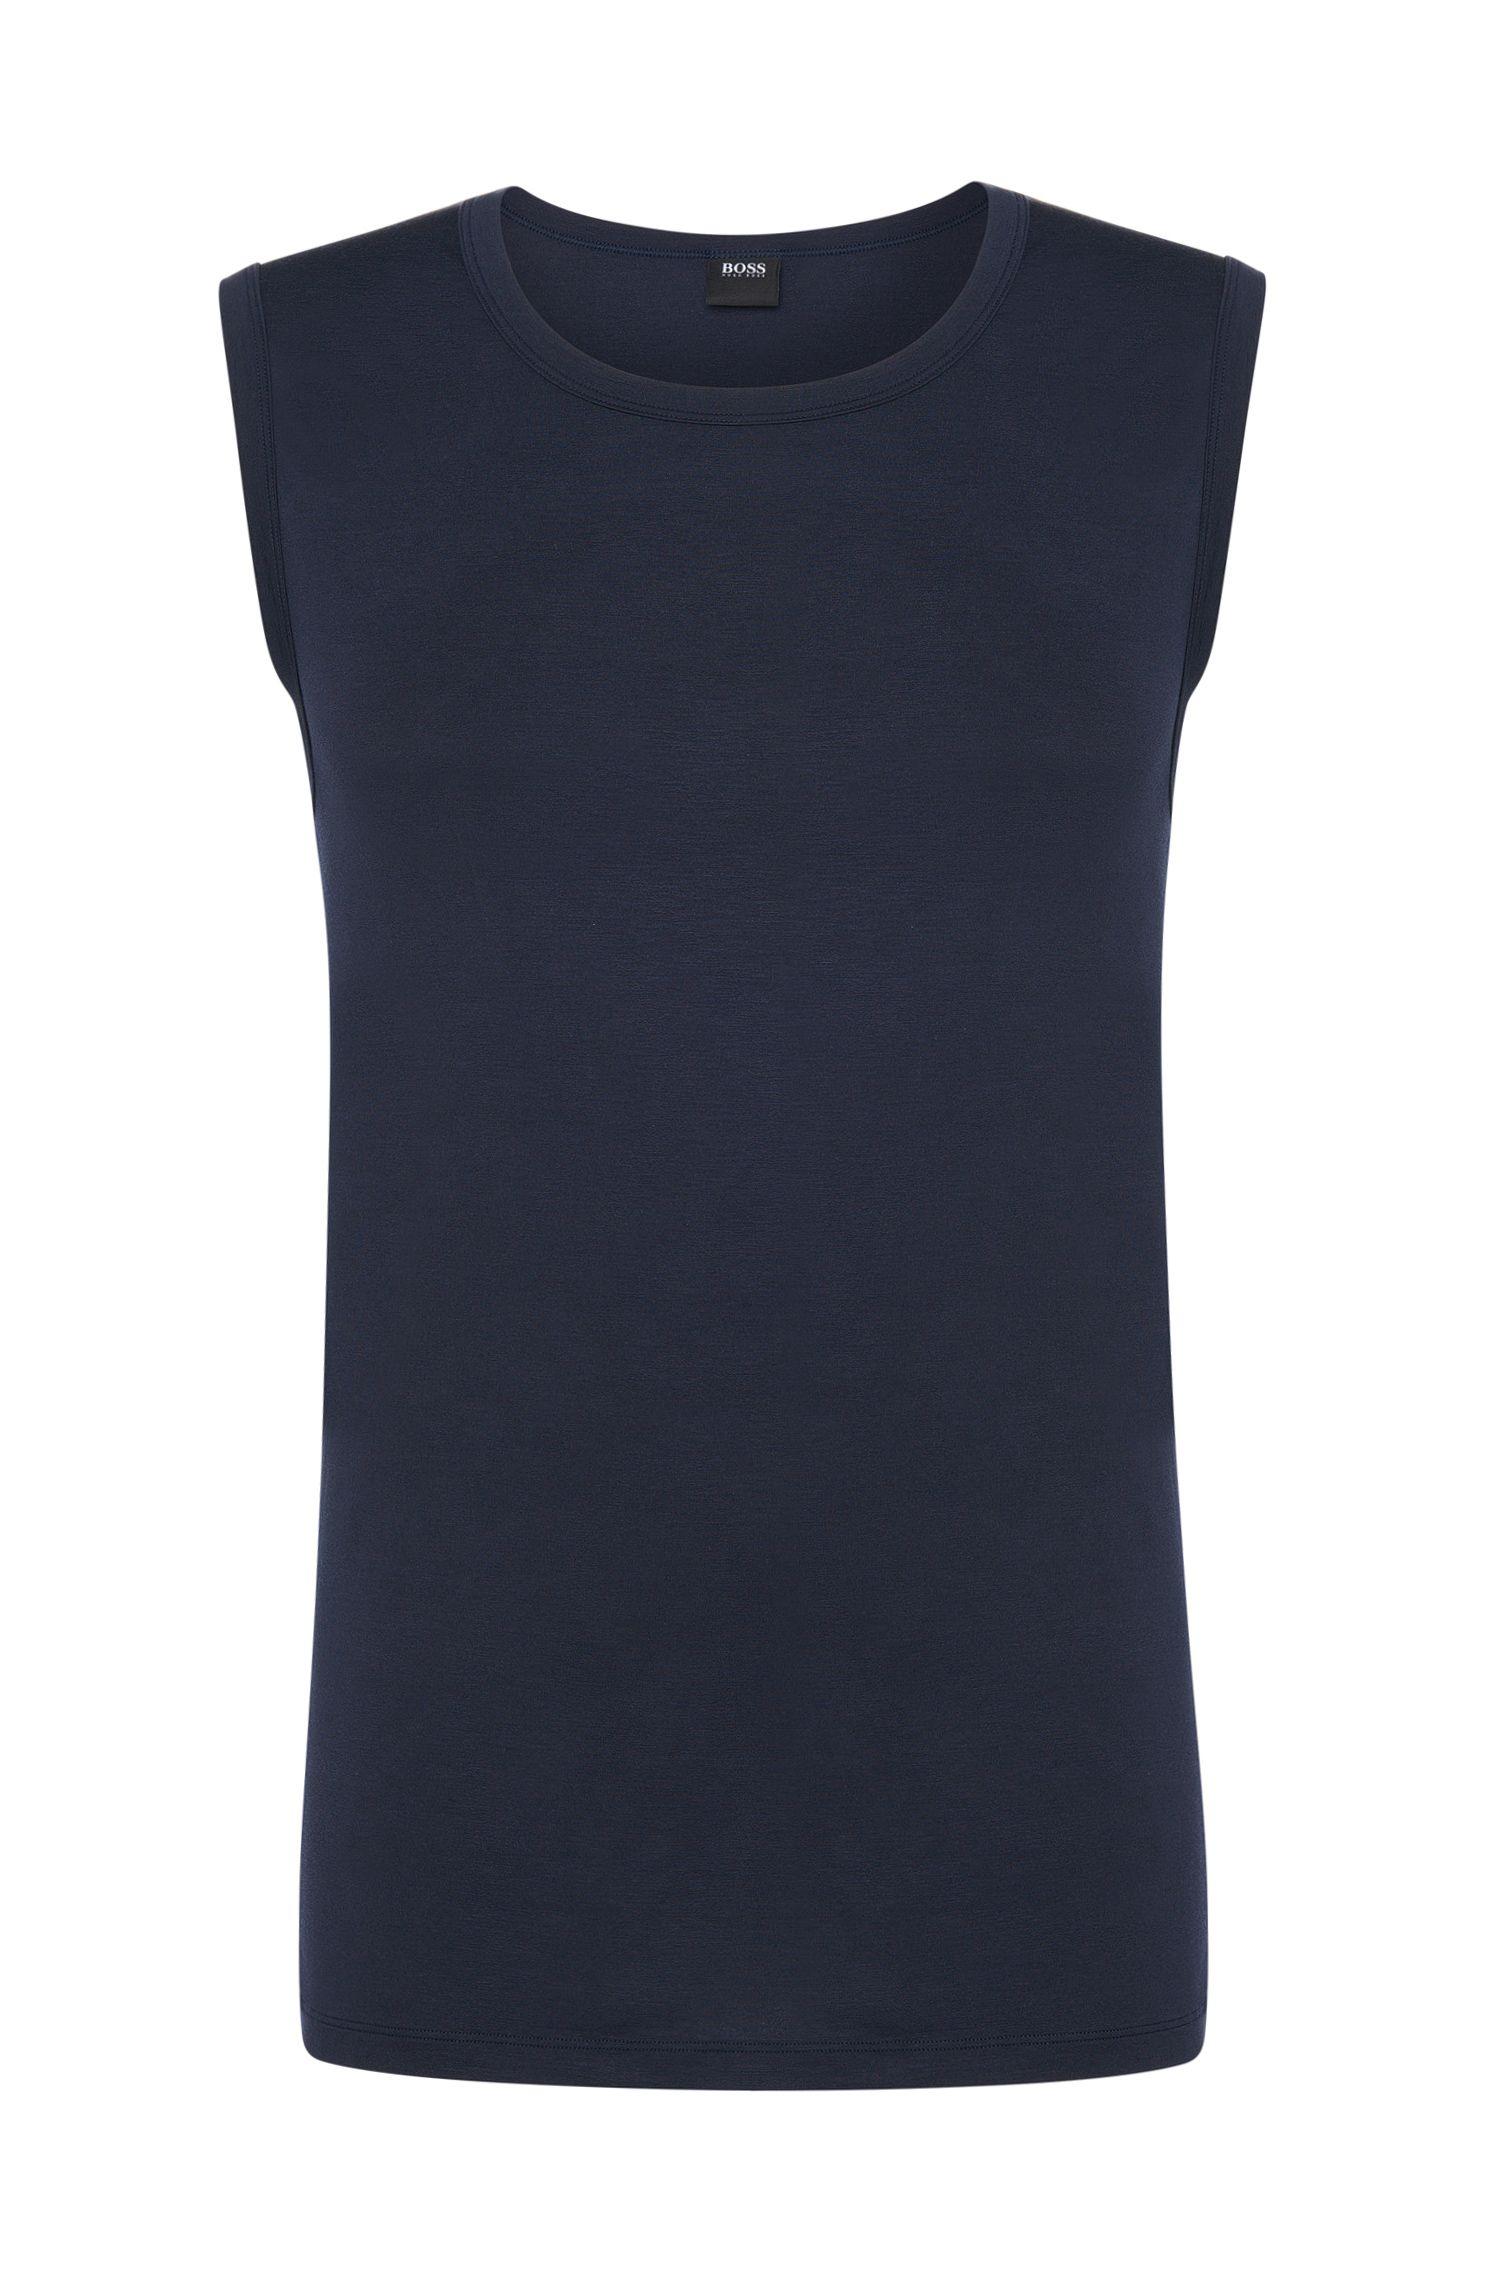 'Shirt SL RN Seacell' | Stretch Modal Blend Sleeveless T-Shirt